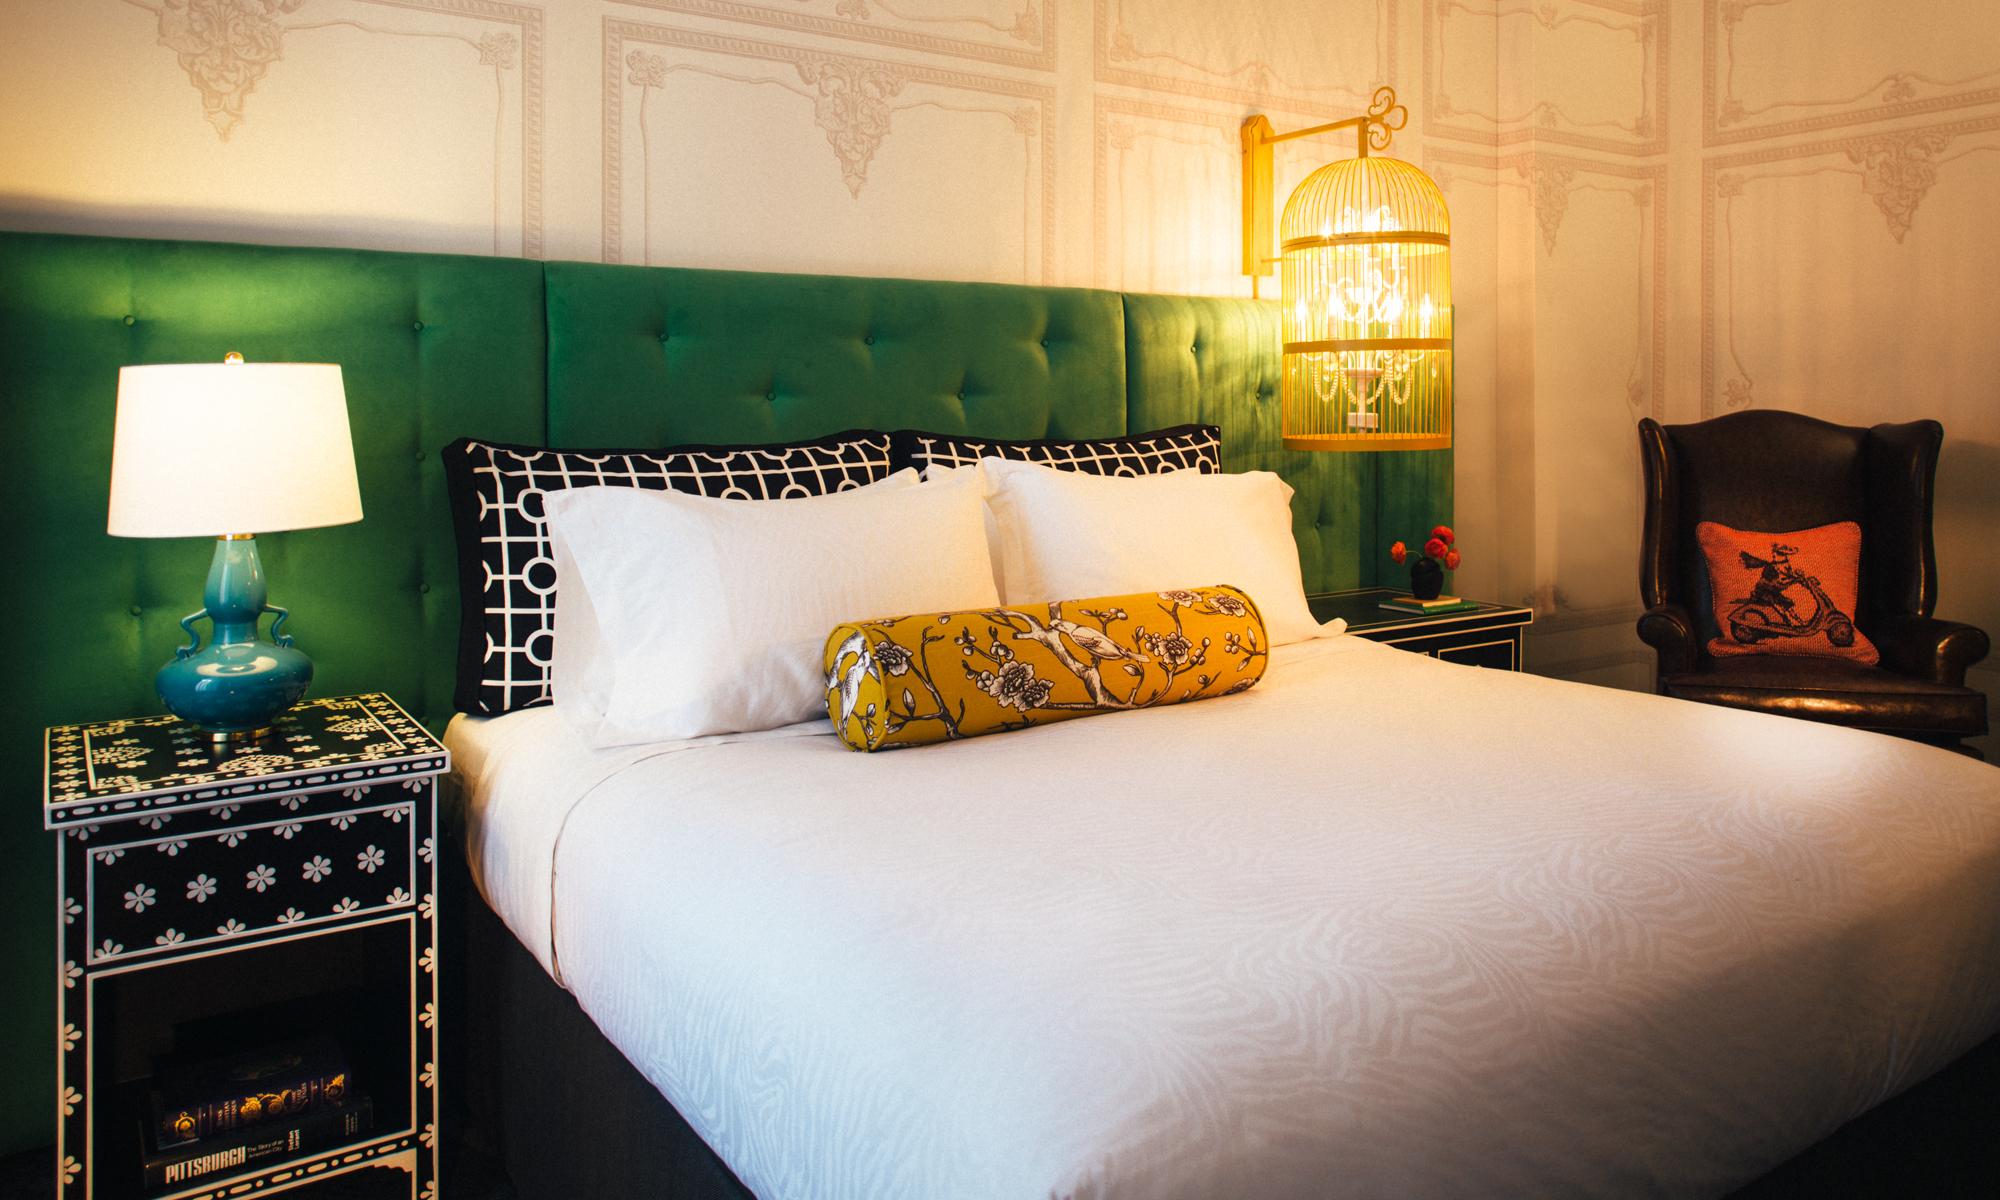 beleco_interiors_hotel_monaco_pittsburgh_07